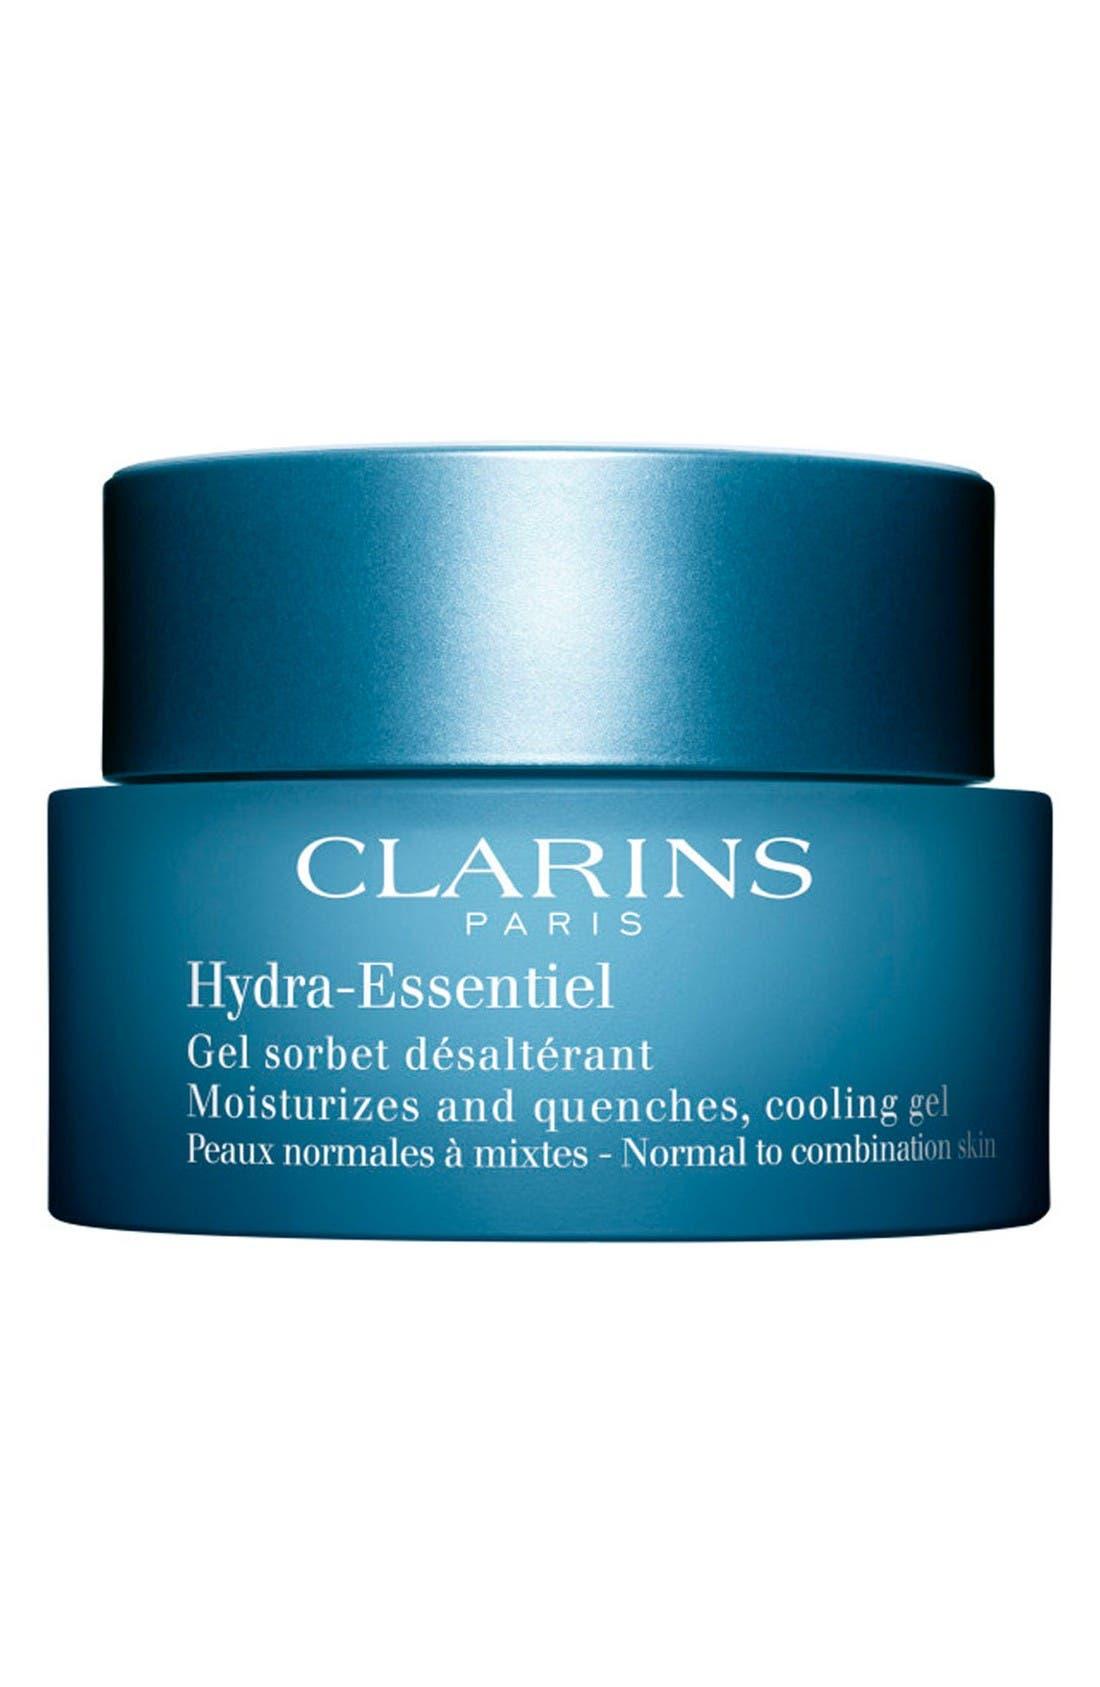 Alternate Image 1 Selected - Clarins Hydra-Essentiel Cream Gel